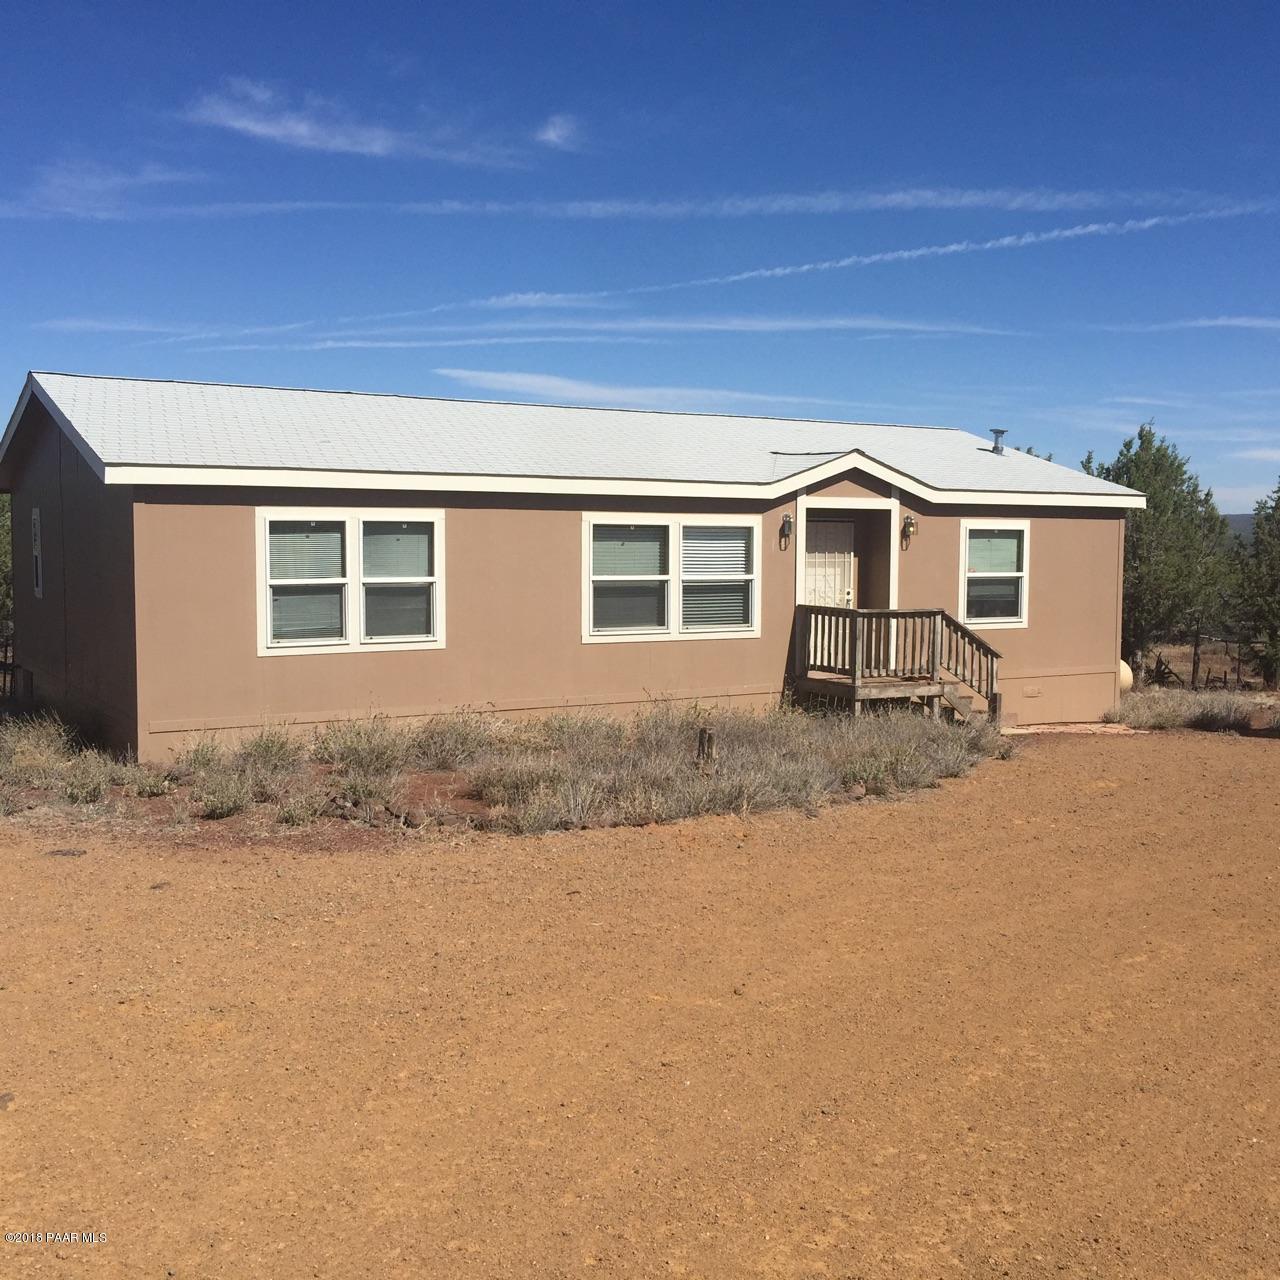 Photo of 2051 Skyline, Ash Fork, AZ 86320